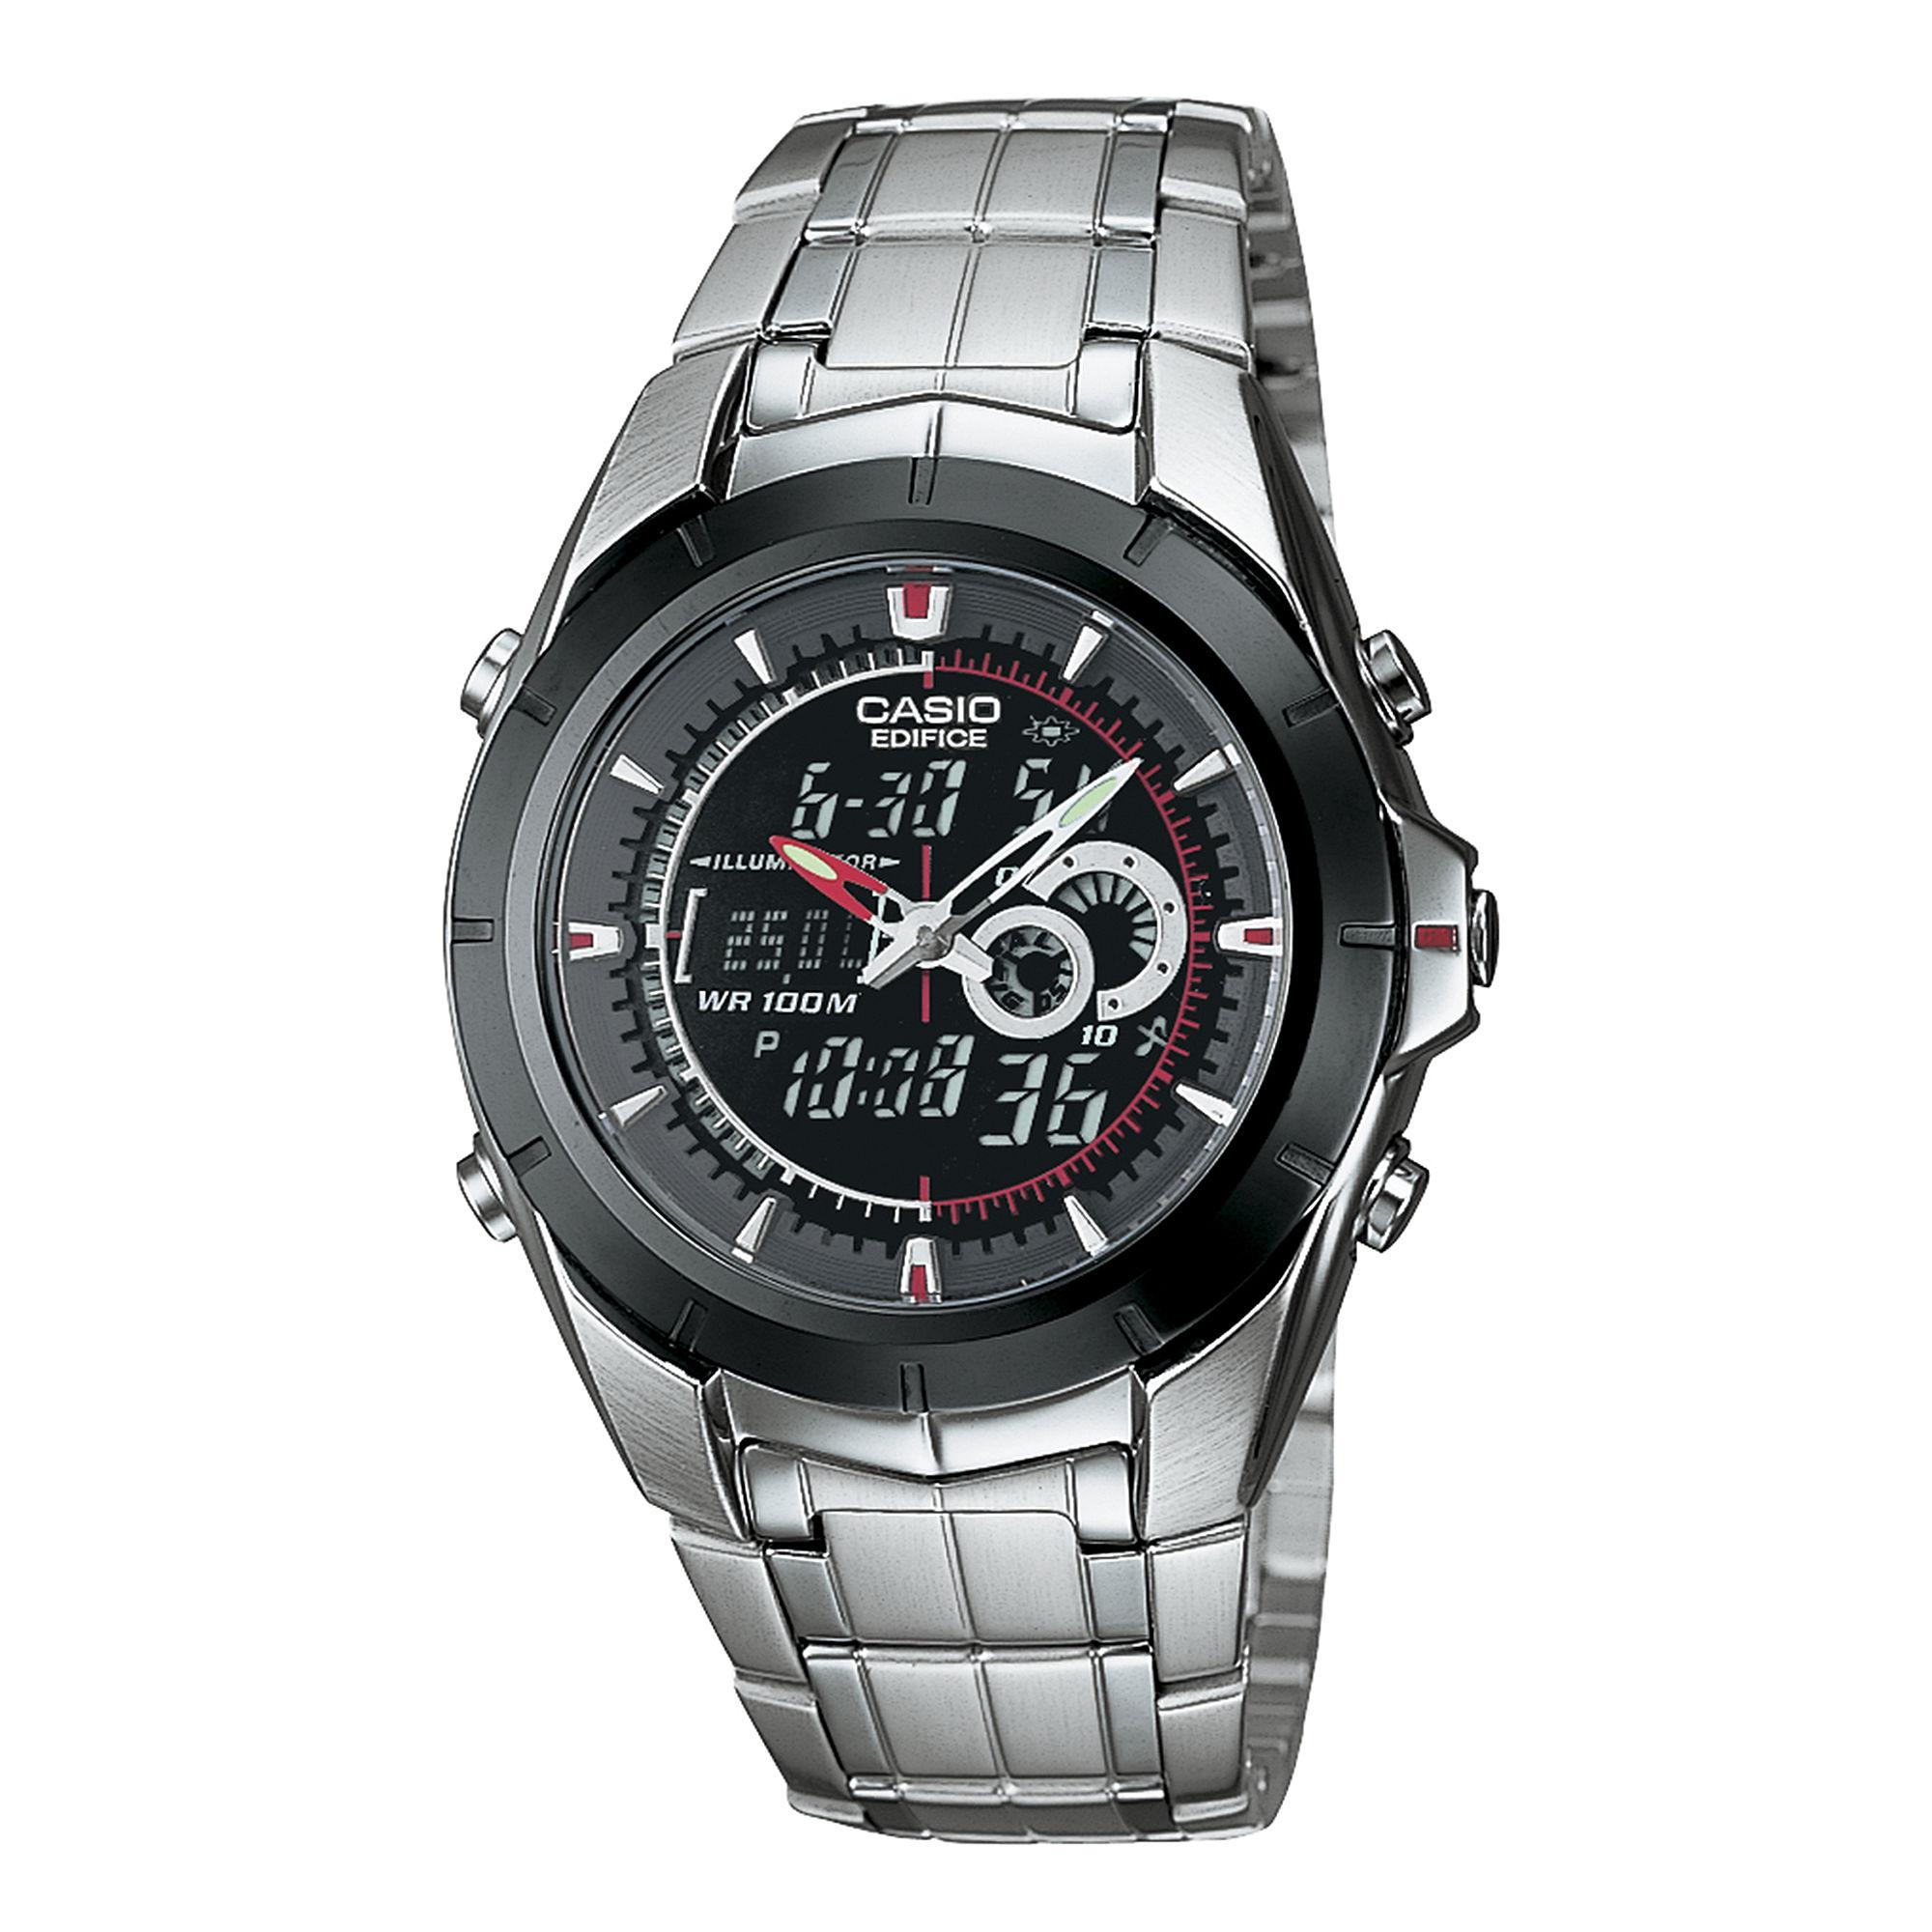 Casio Edifice Mens Stainless Steel Analog/Digital Watch EFA119BK-1AV